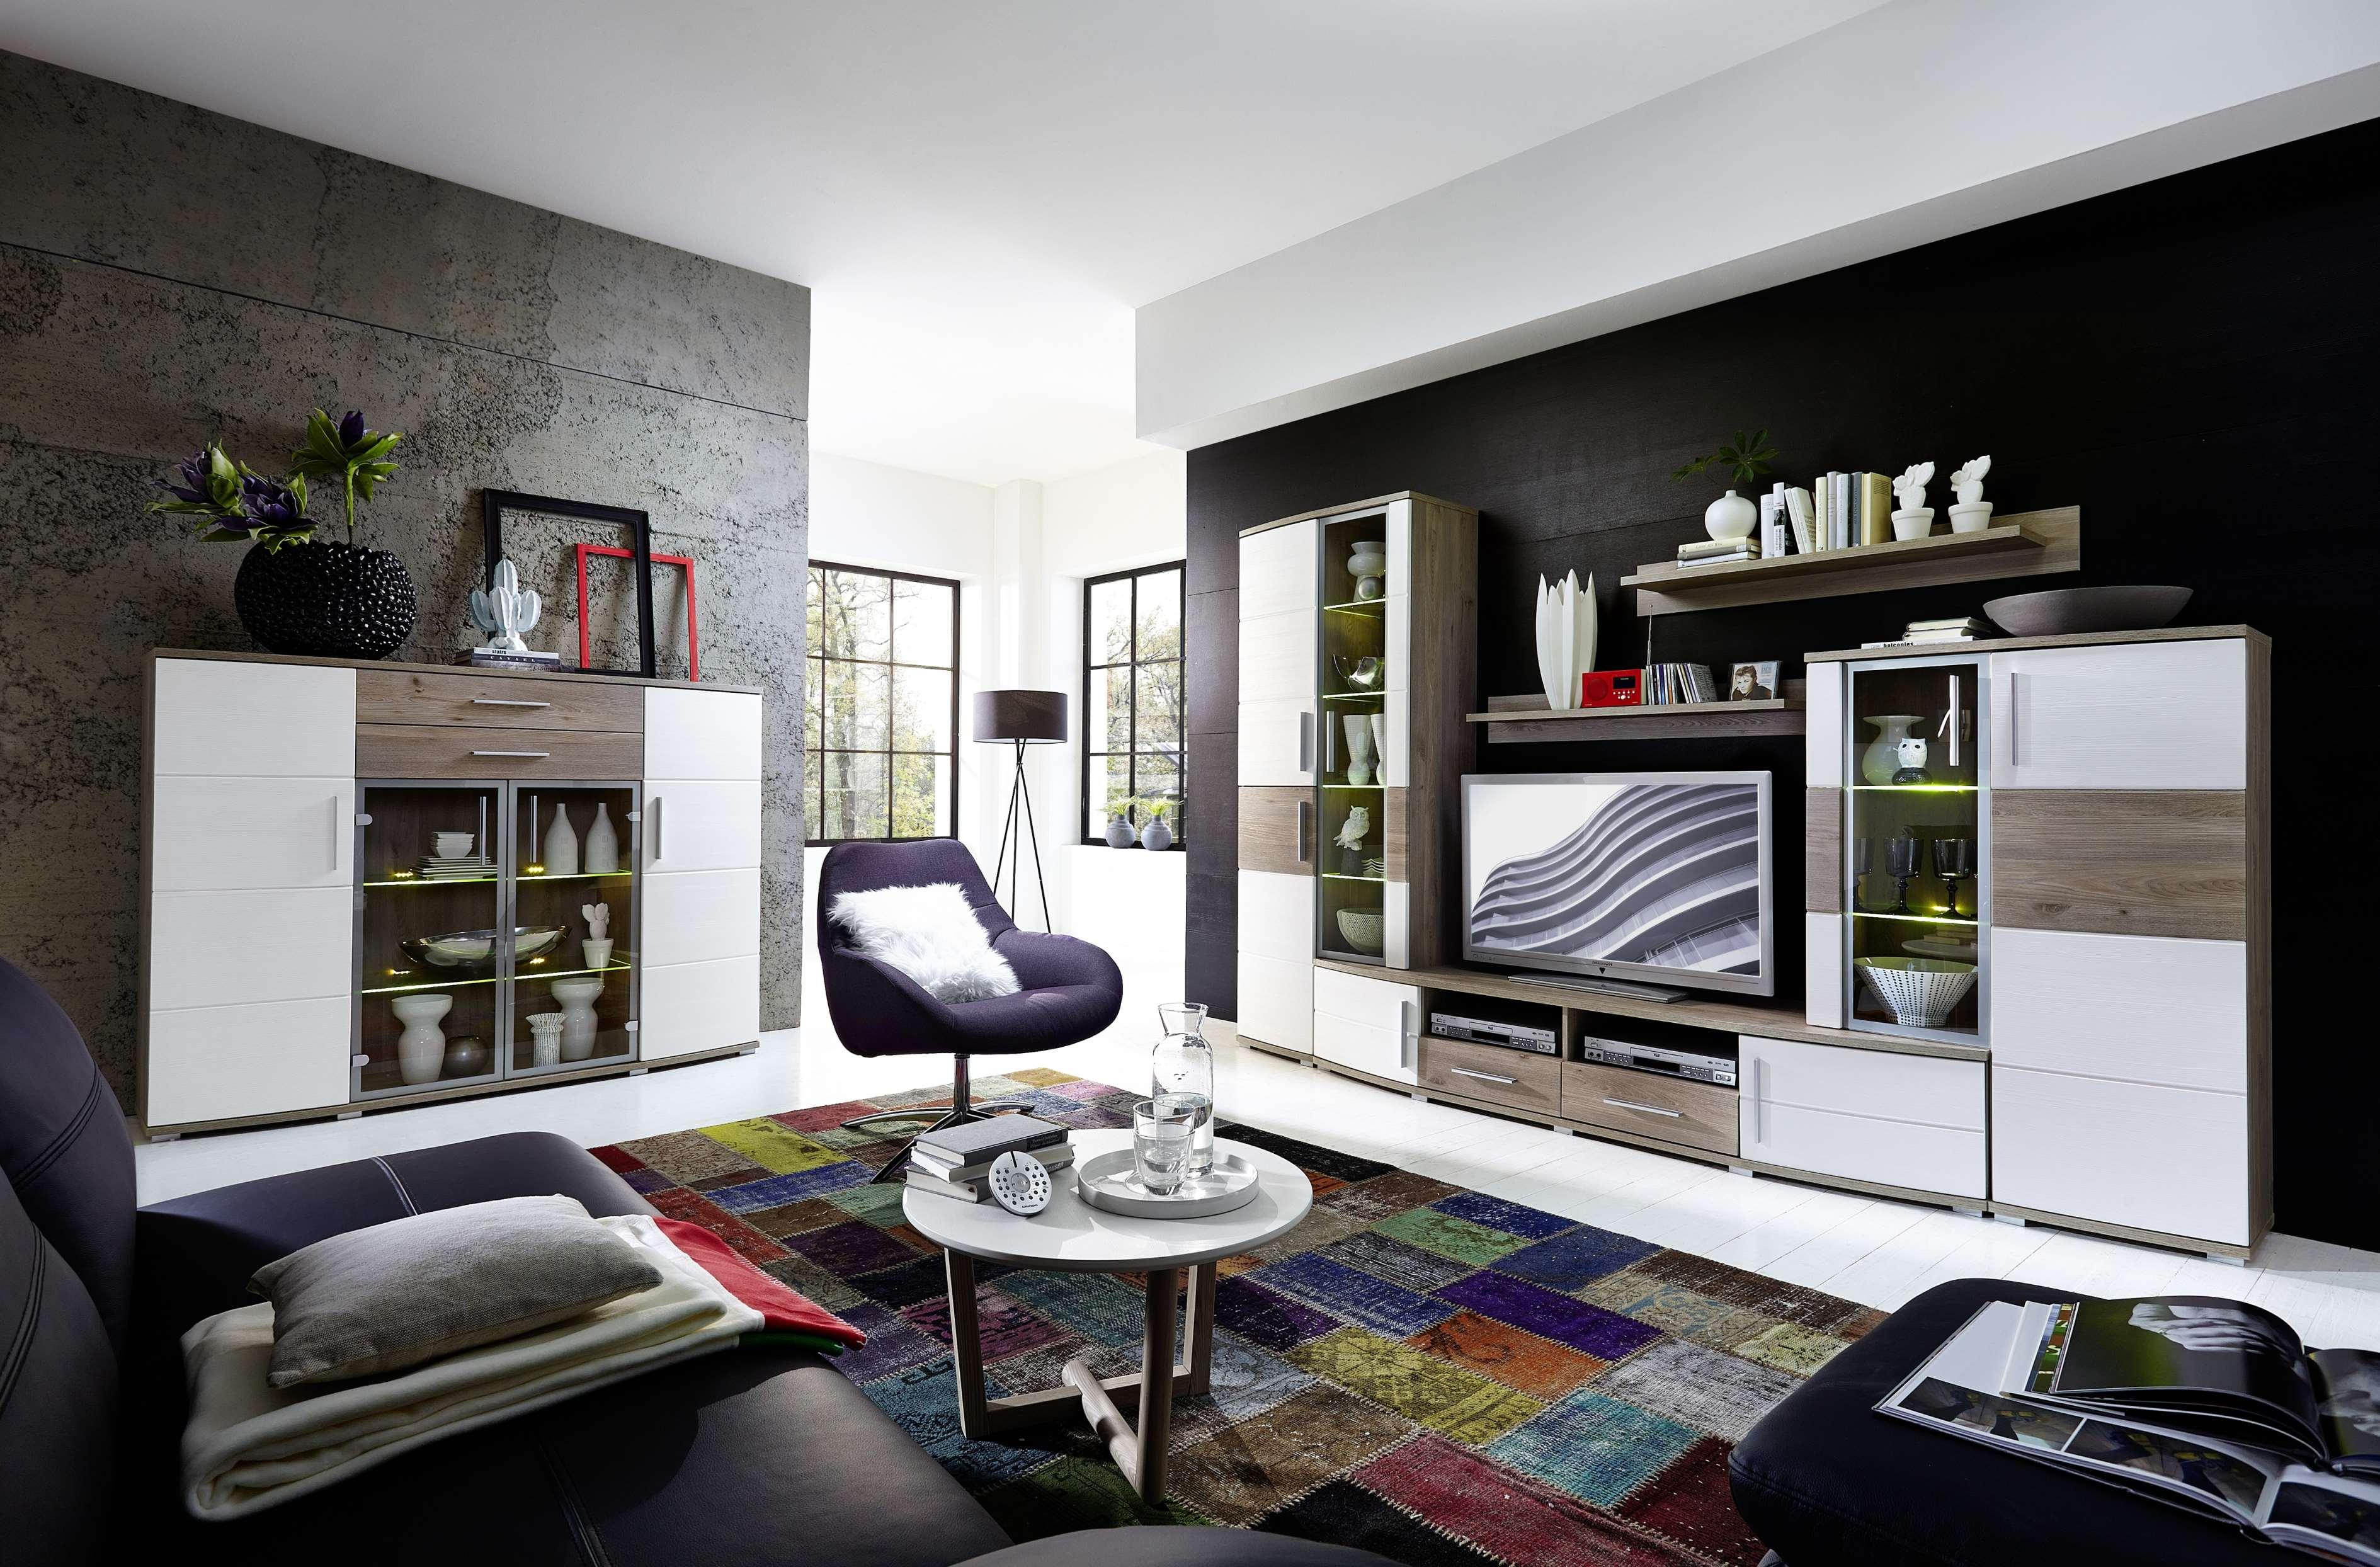 wohnwand jam 5tlg wohnzimmer set 300cm vitrine wandboard tv regal wei eiche led ebay. Black Bedroom Furniture Sets. Home Design Ideas